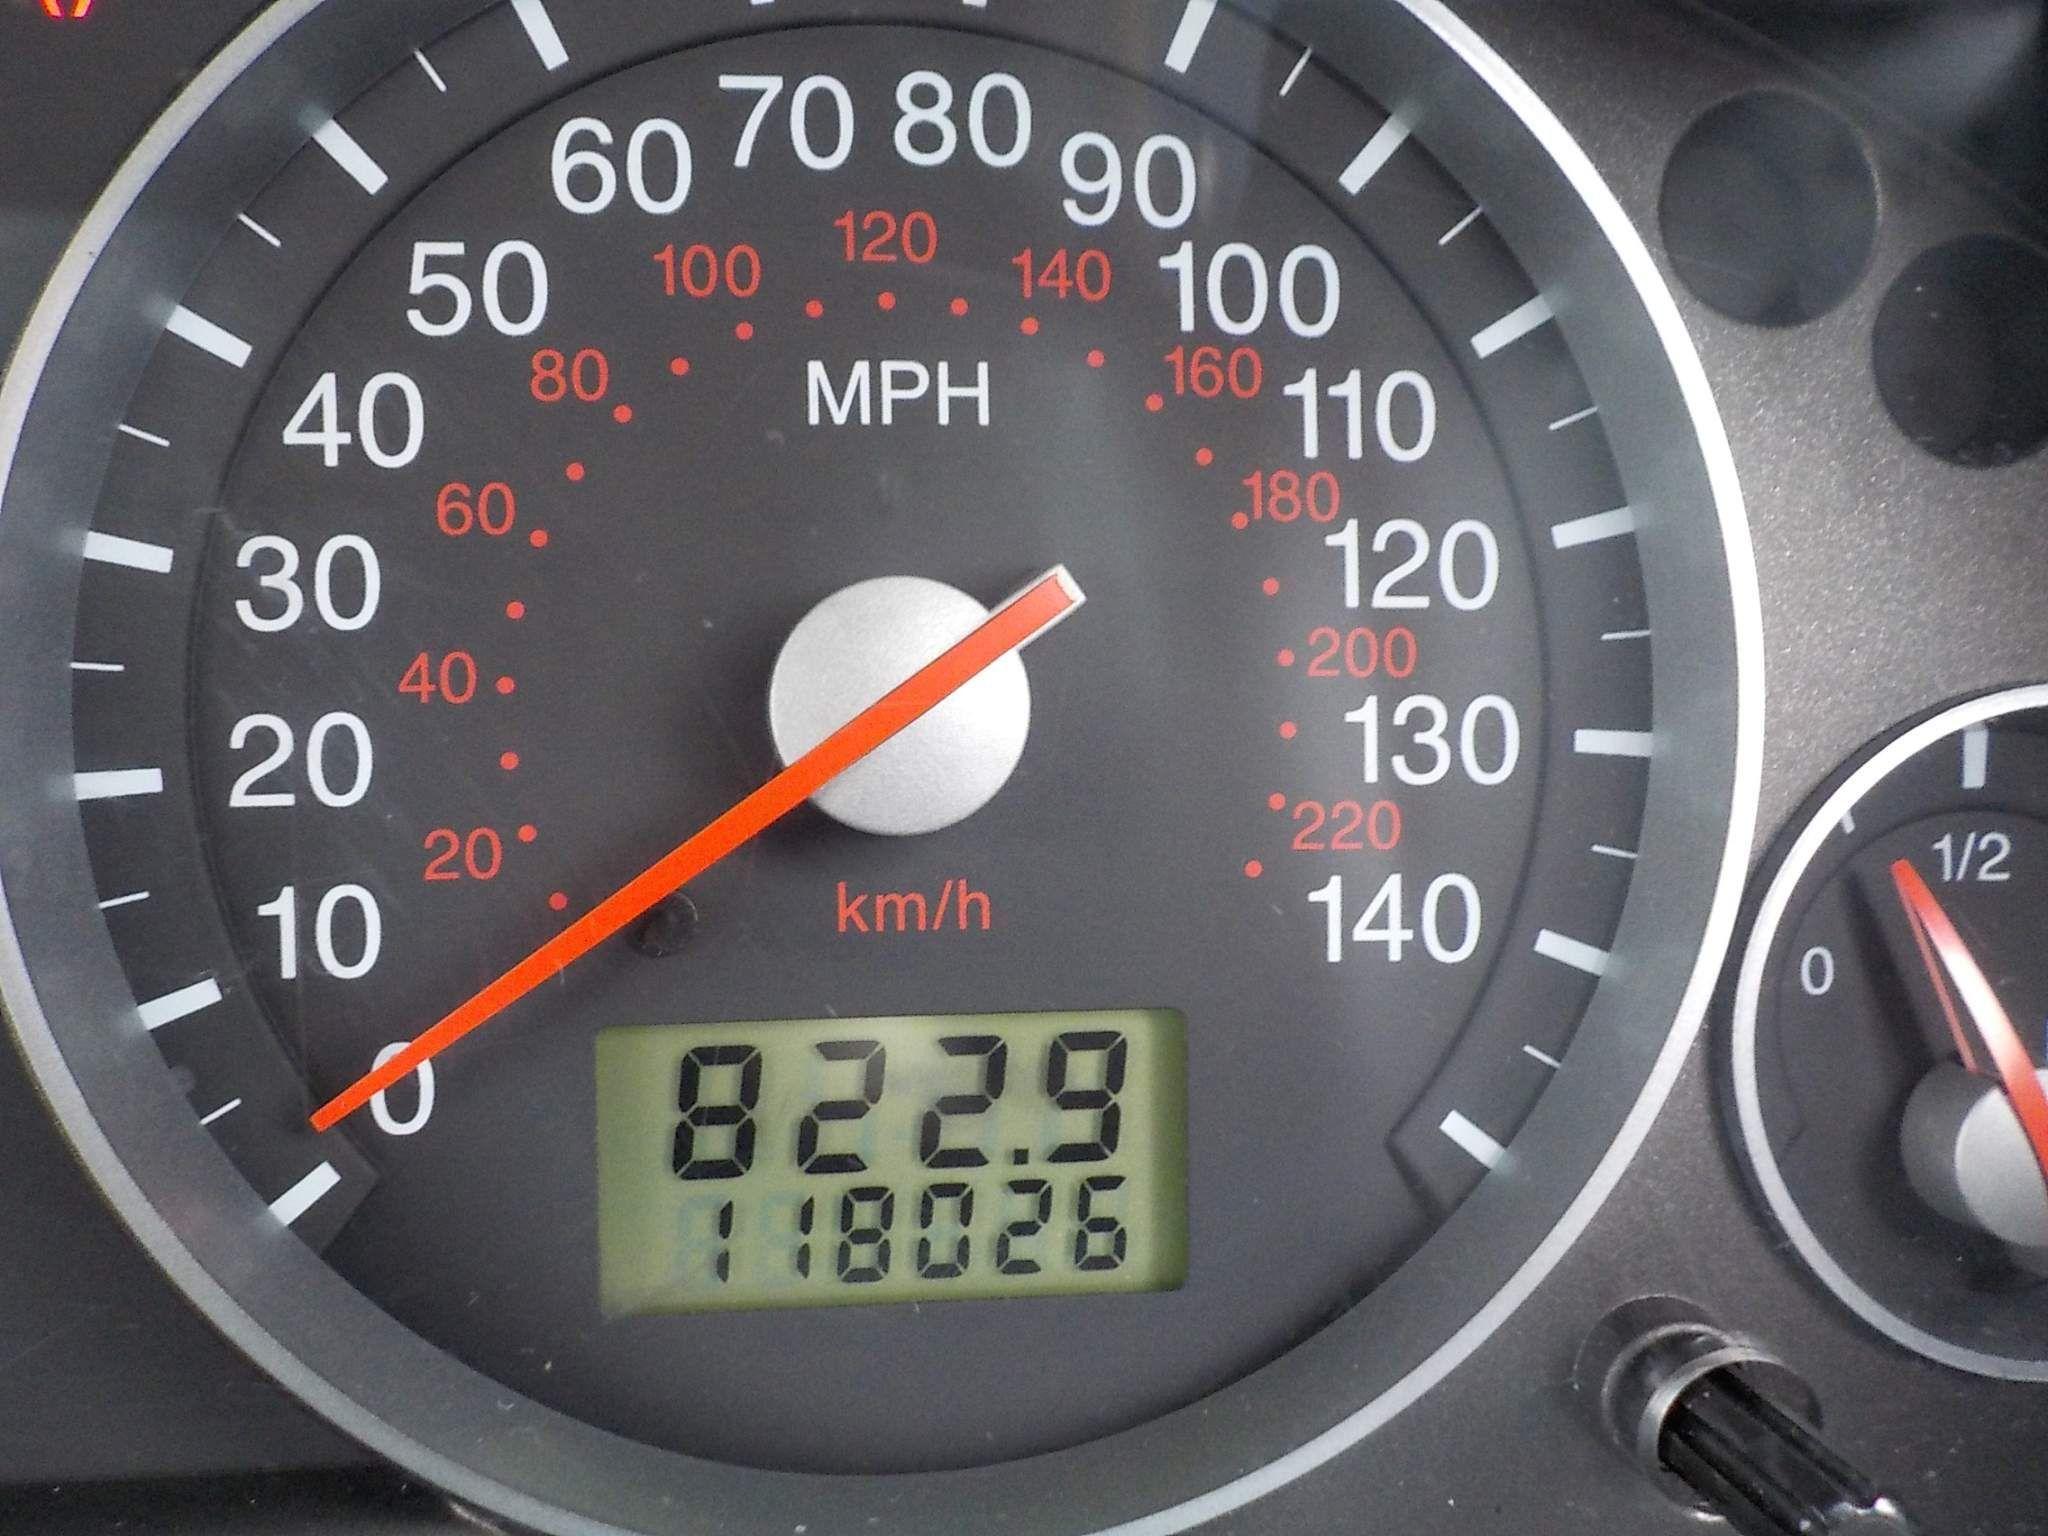 Ford Mondeo 2.0 TDCi SIV LX 4dr